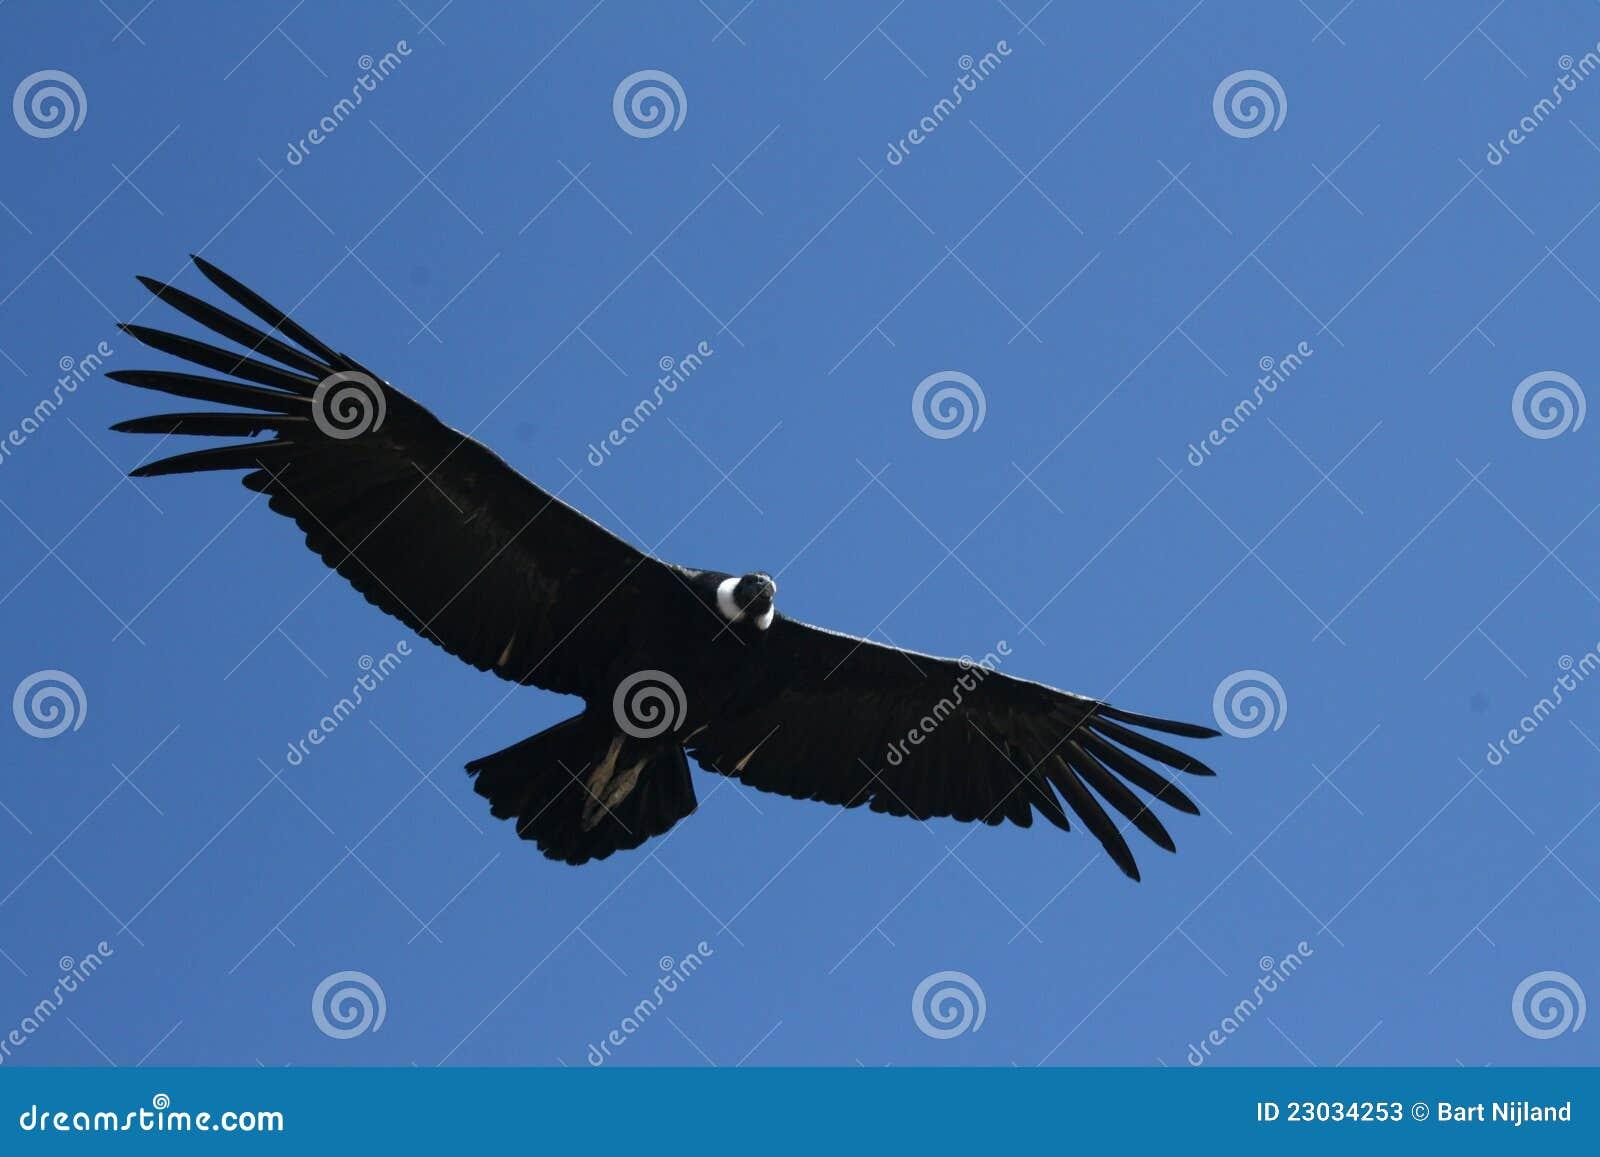 Andyjski jaru colca kondora gryphus vultur